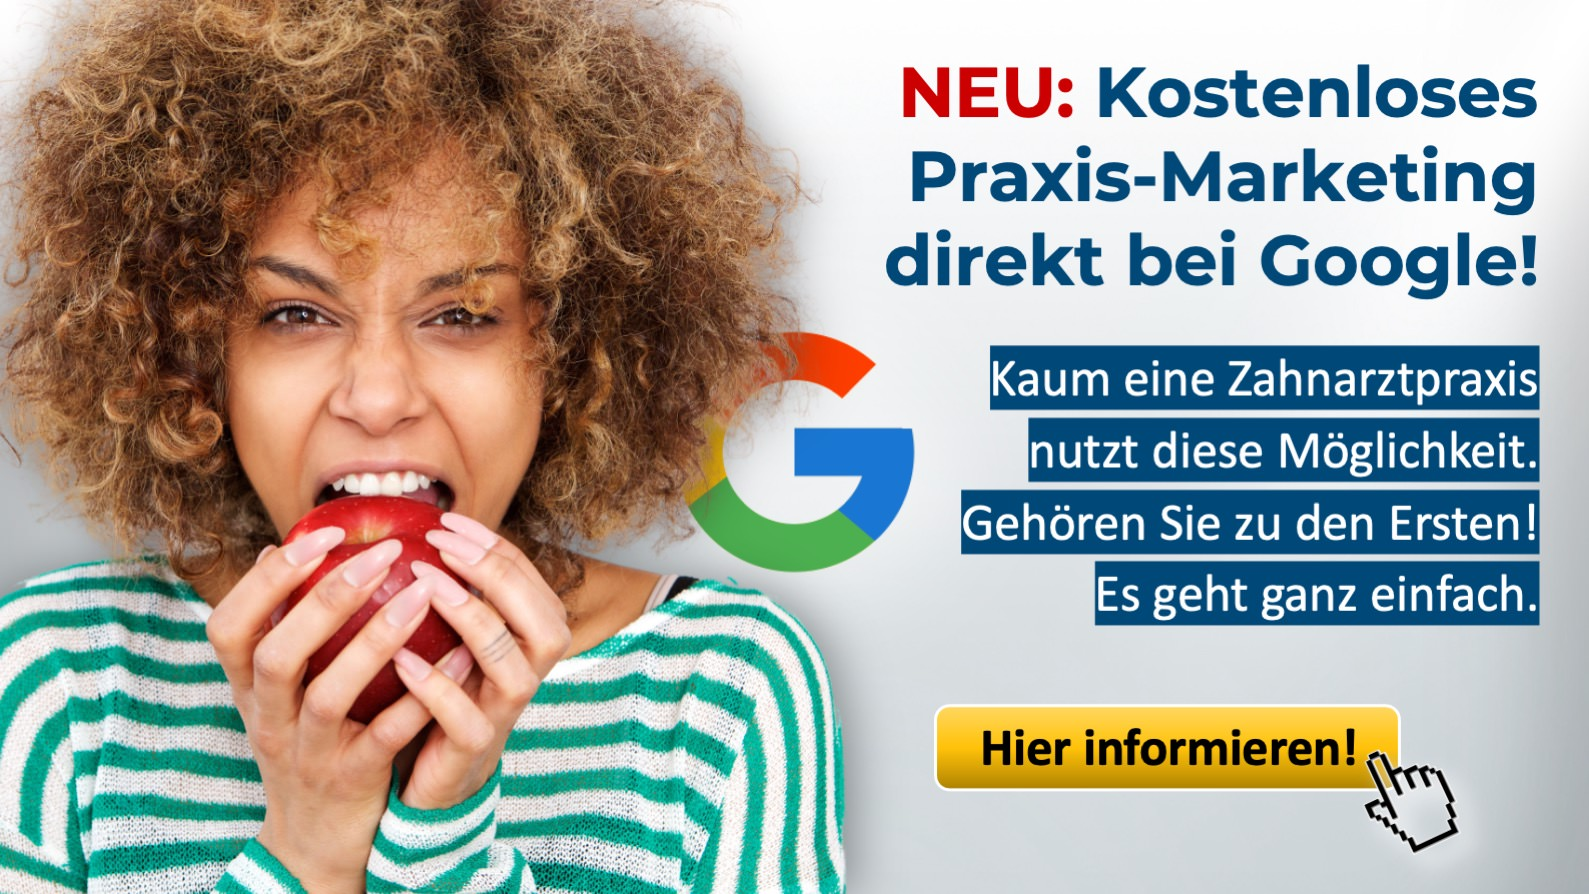 Praxis-Marketing bei Google My Business